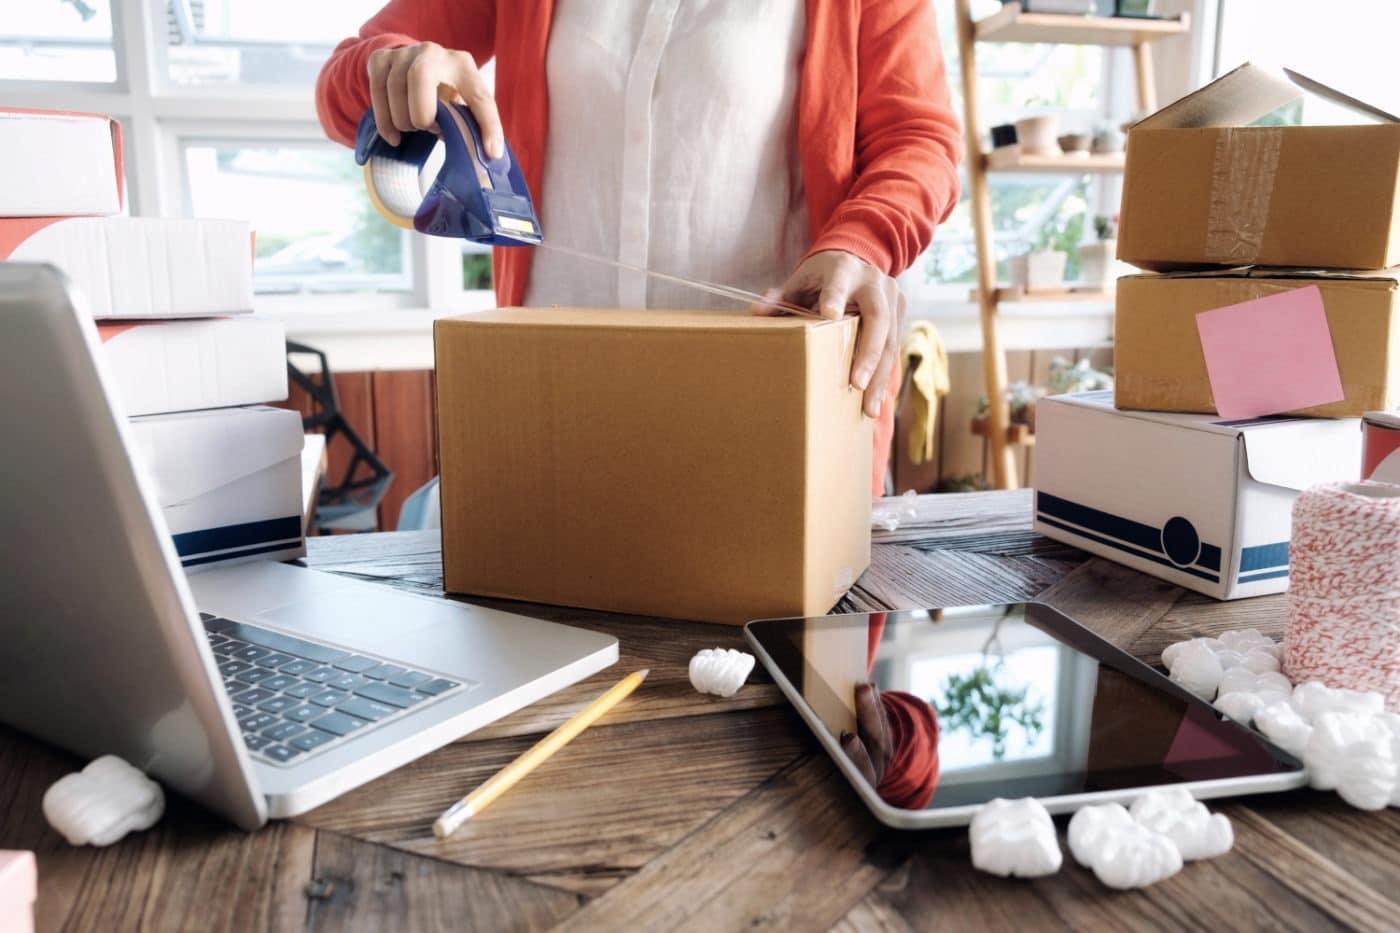 How self storage helps interior decorators